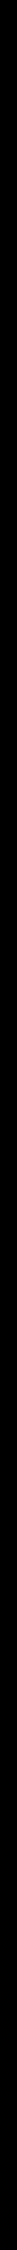 black copy 11.jpg